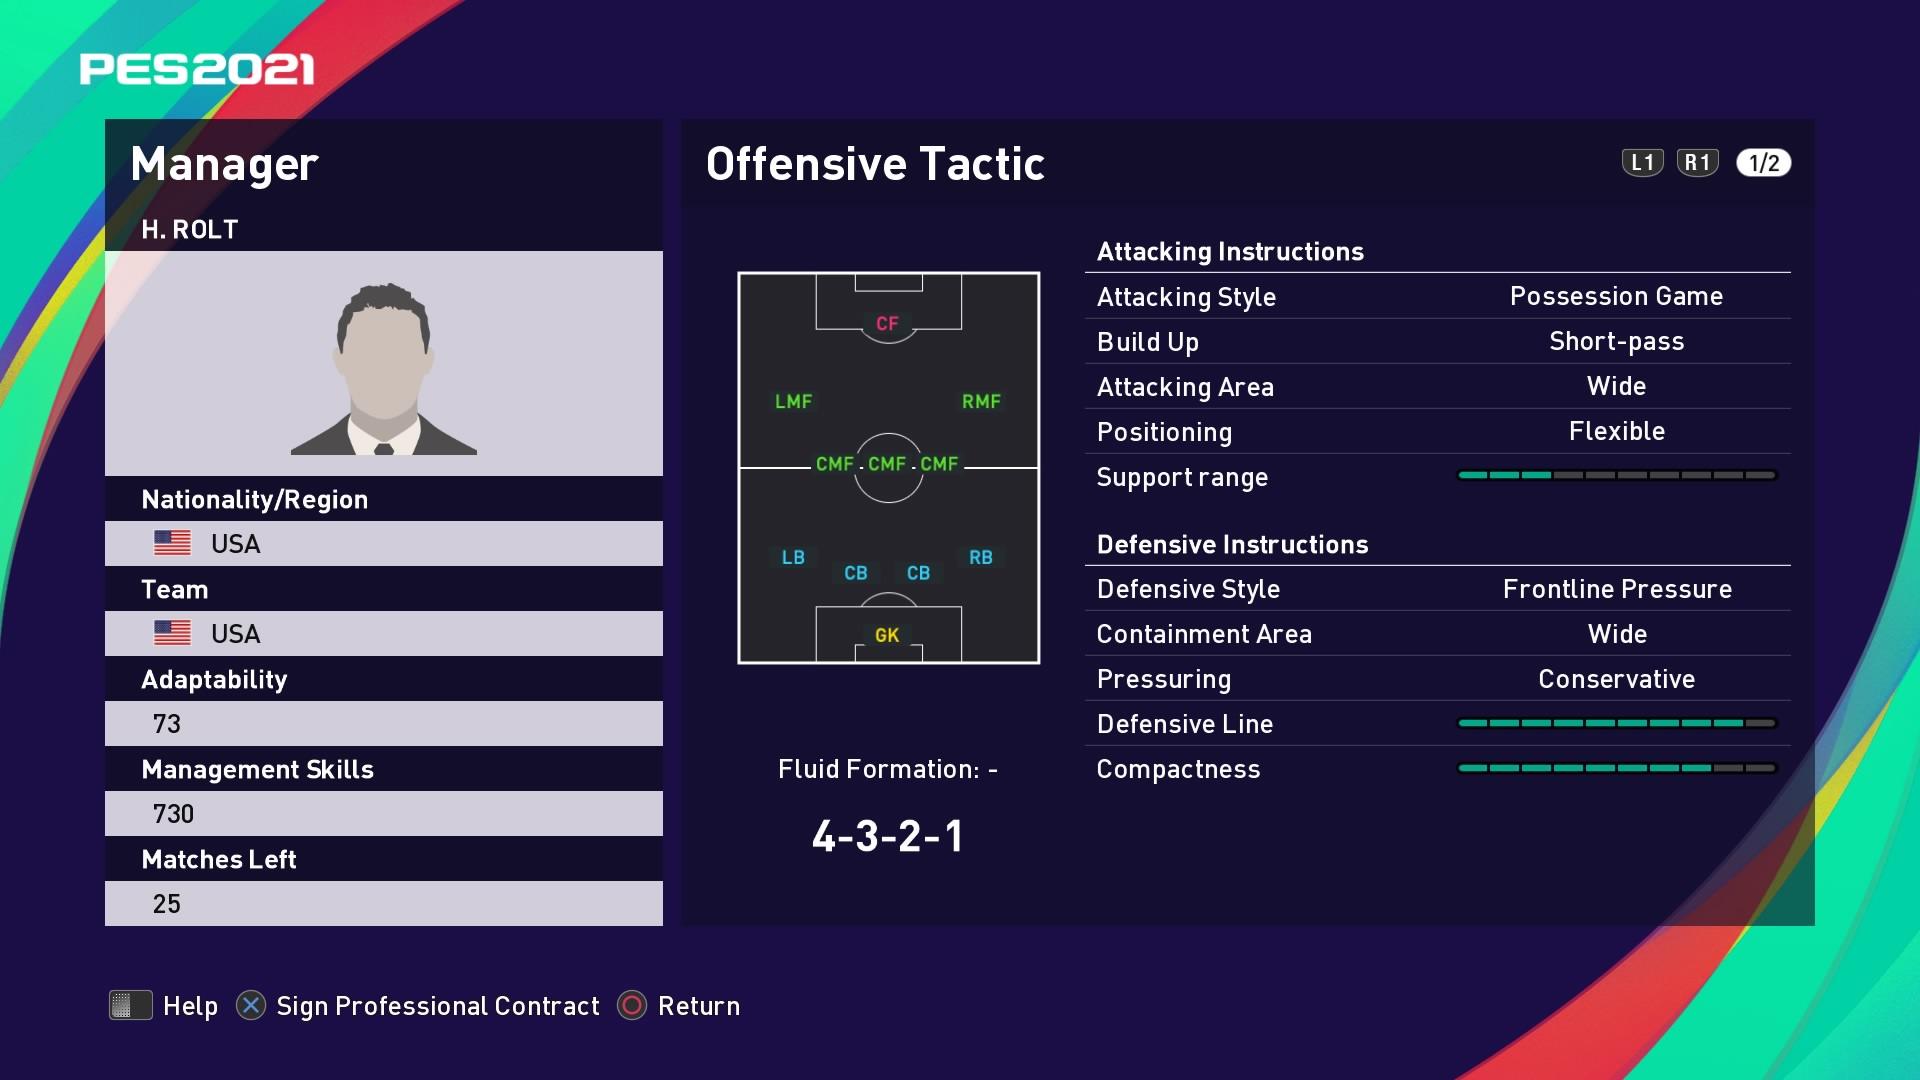 H. Rolt (Gregg Berhalter) Offensive Tactic in PES 2021 myClub